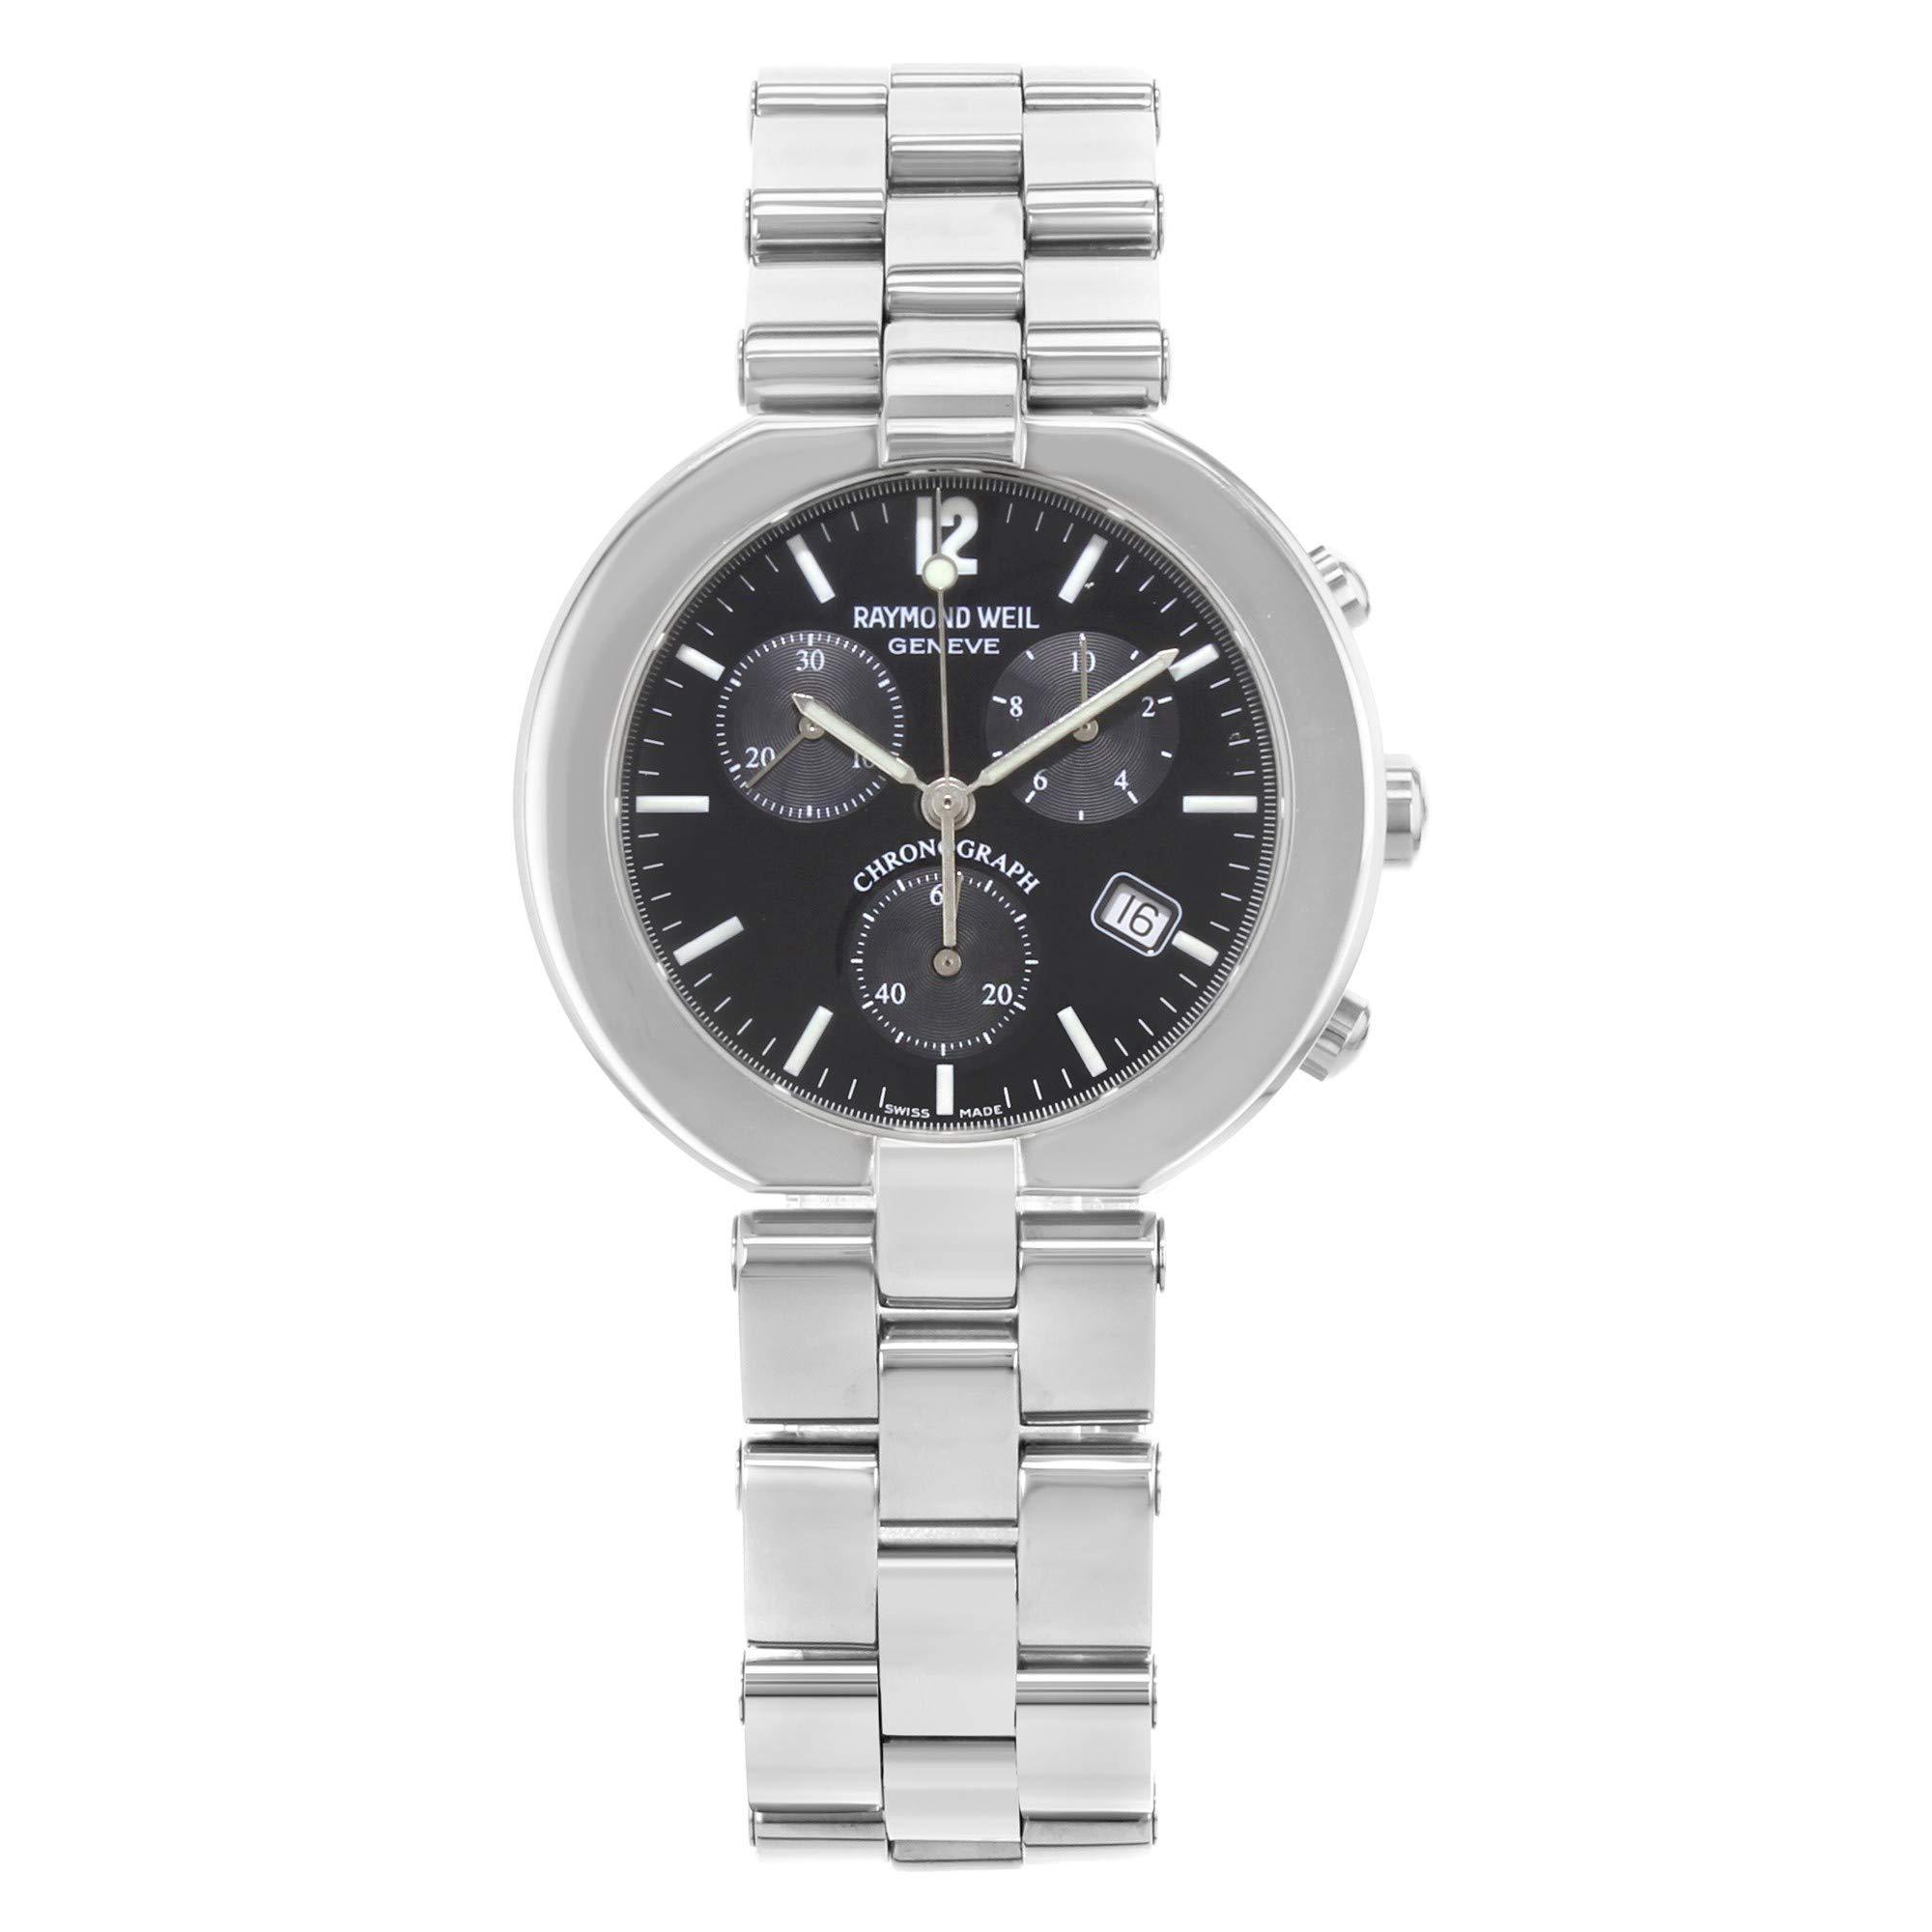 Raymond Weil Allegro Quartz Male Watch 4817S-BK (Certified Pre-Owned)